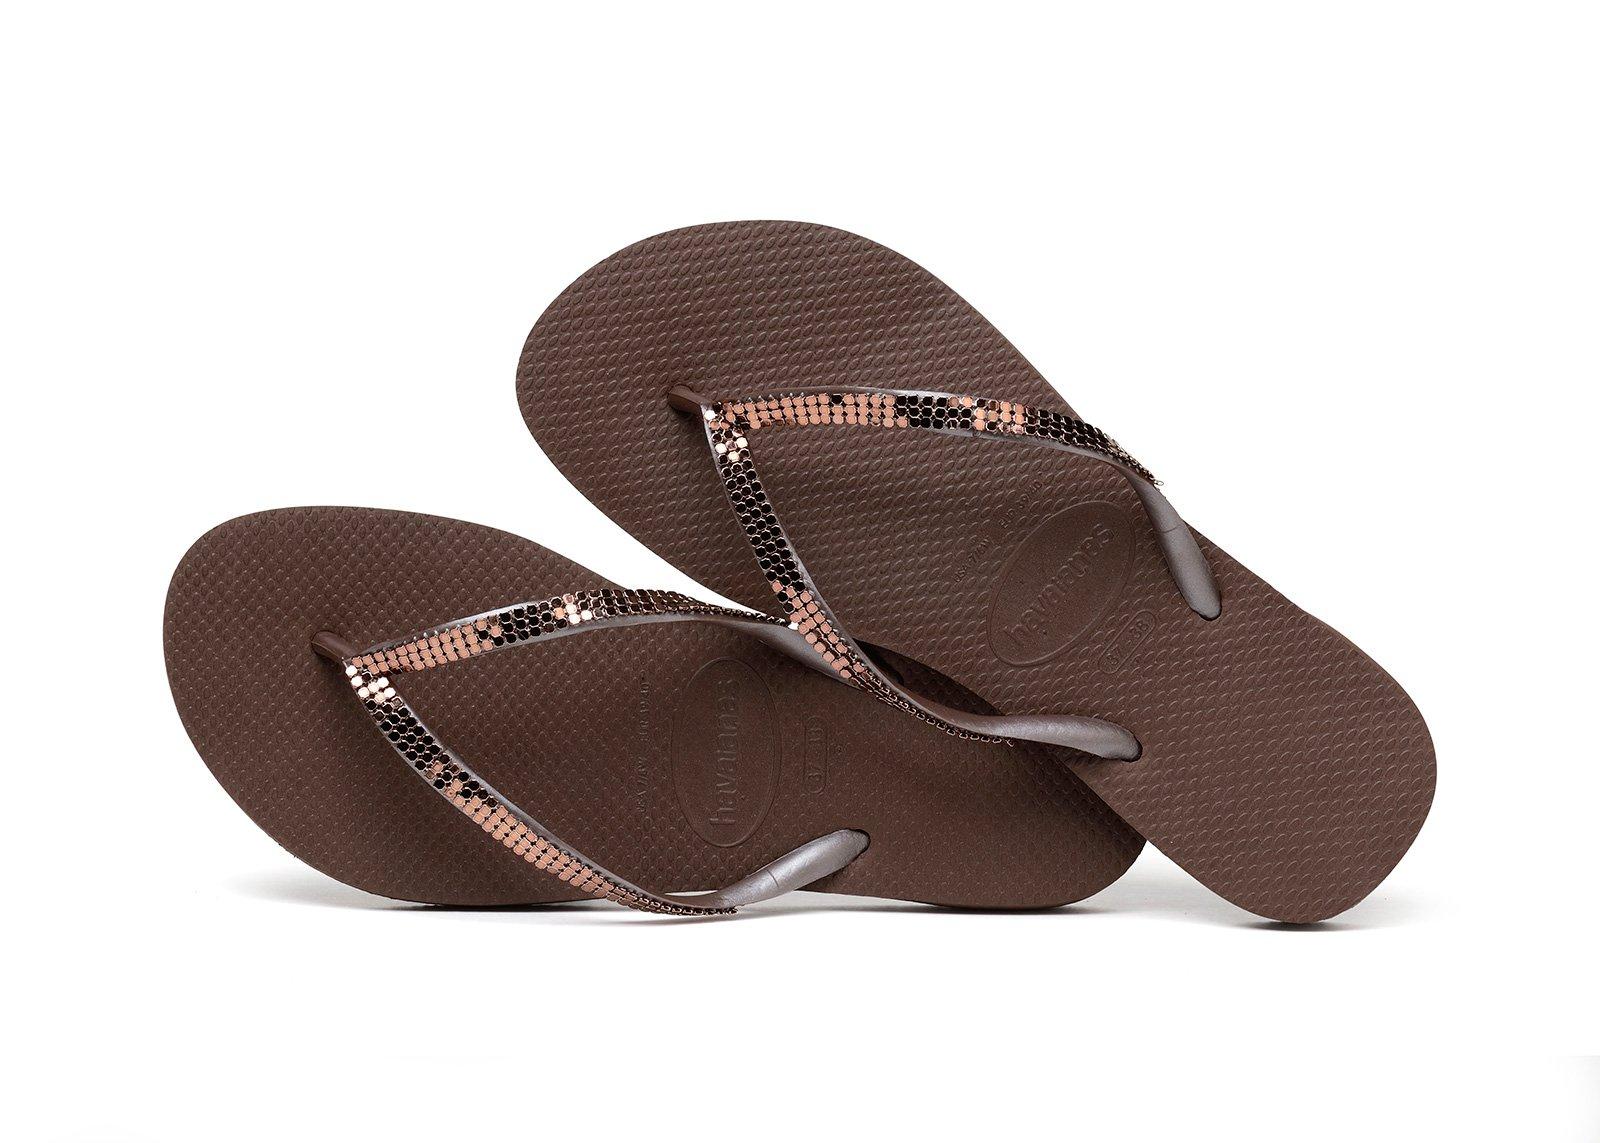 84f7a9d7f35d Flip-Flops Flip-flops - Havaianas Slim Metal Mesh Dark Brown